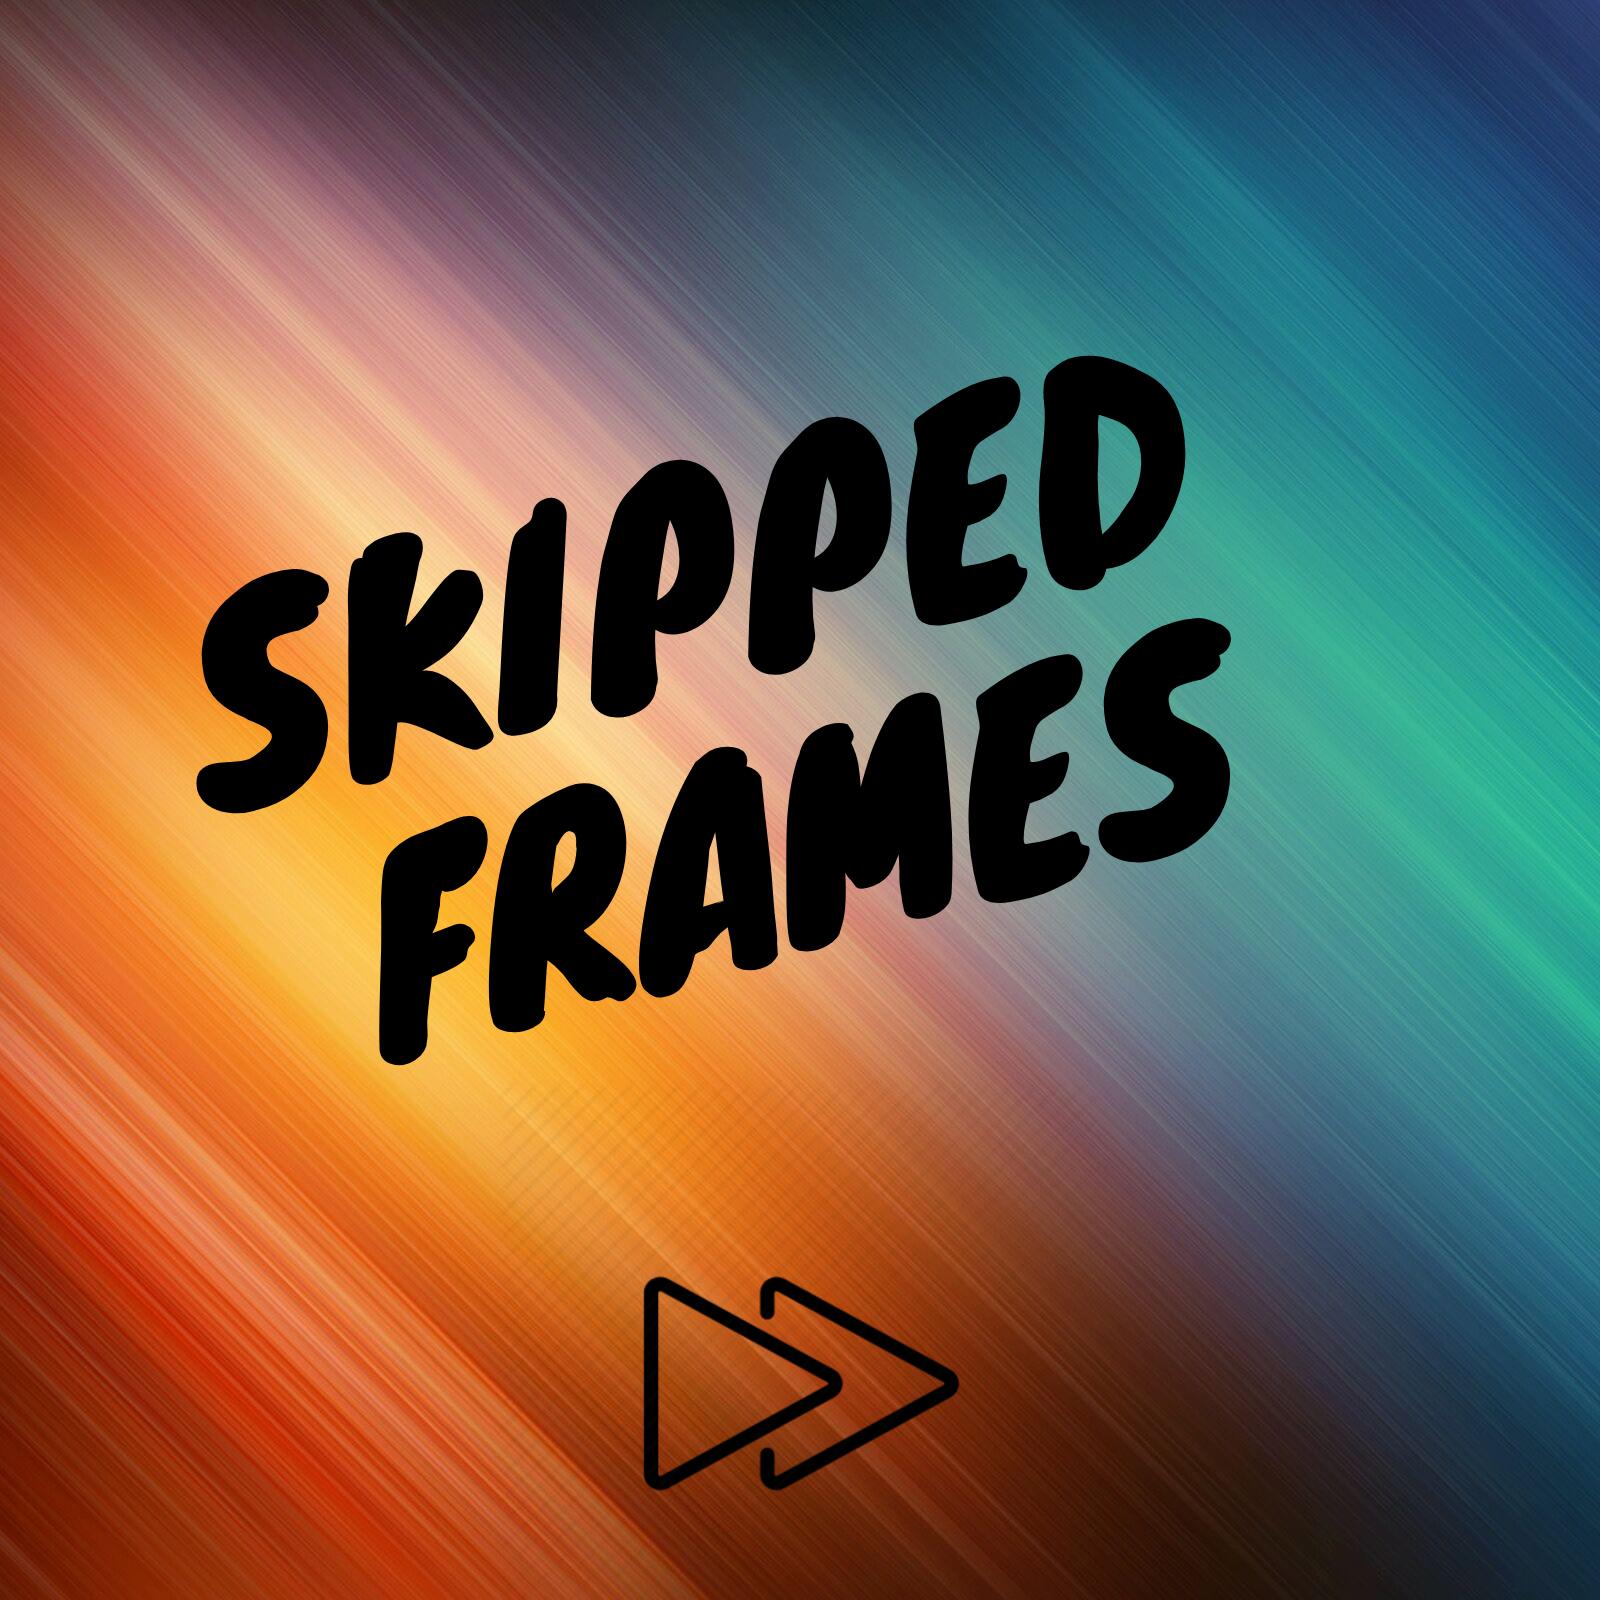 Skipped Frames